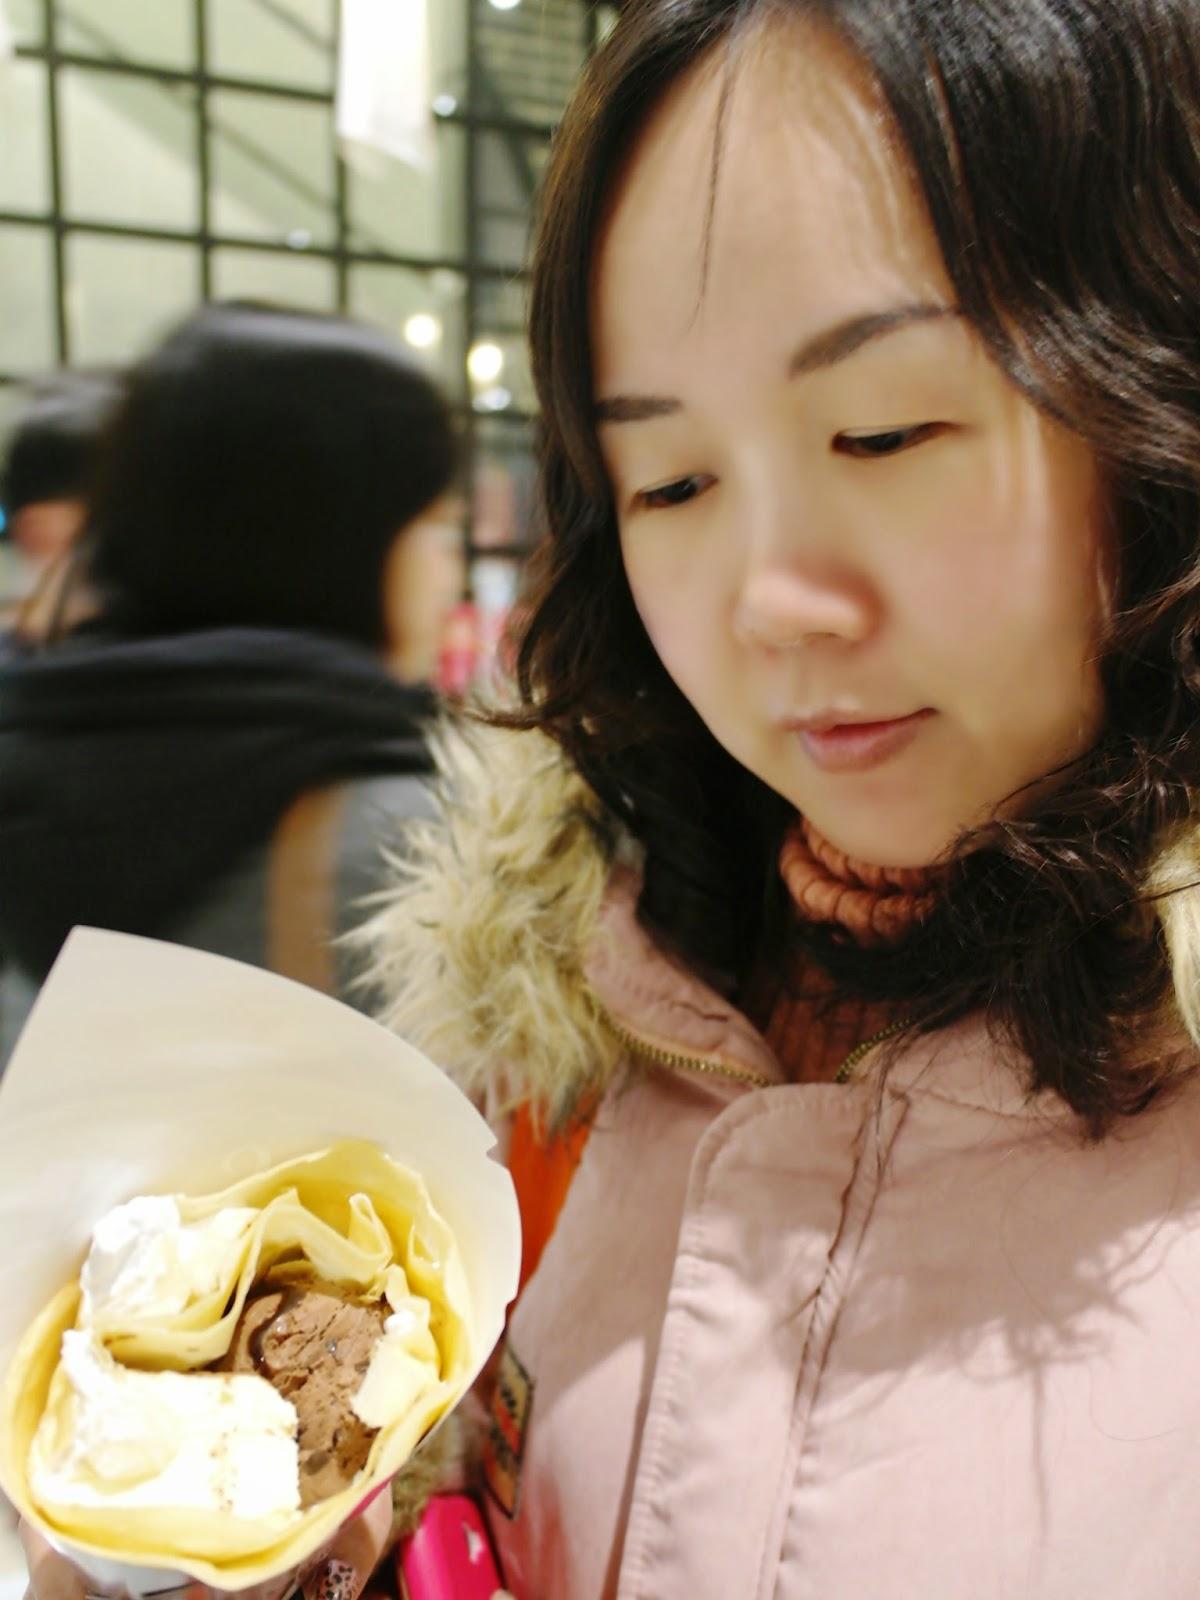 www.meheartseoul.blogspot.com (Vera Lee)